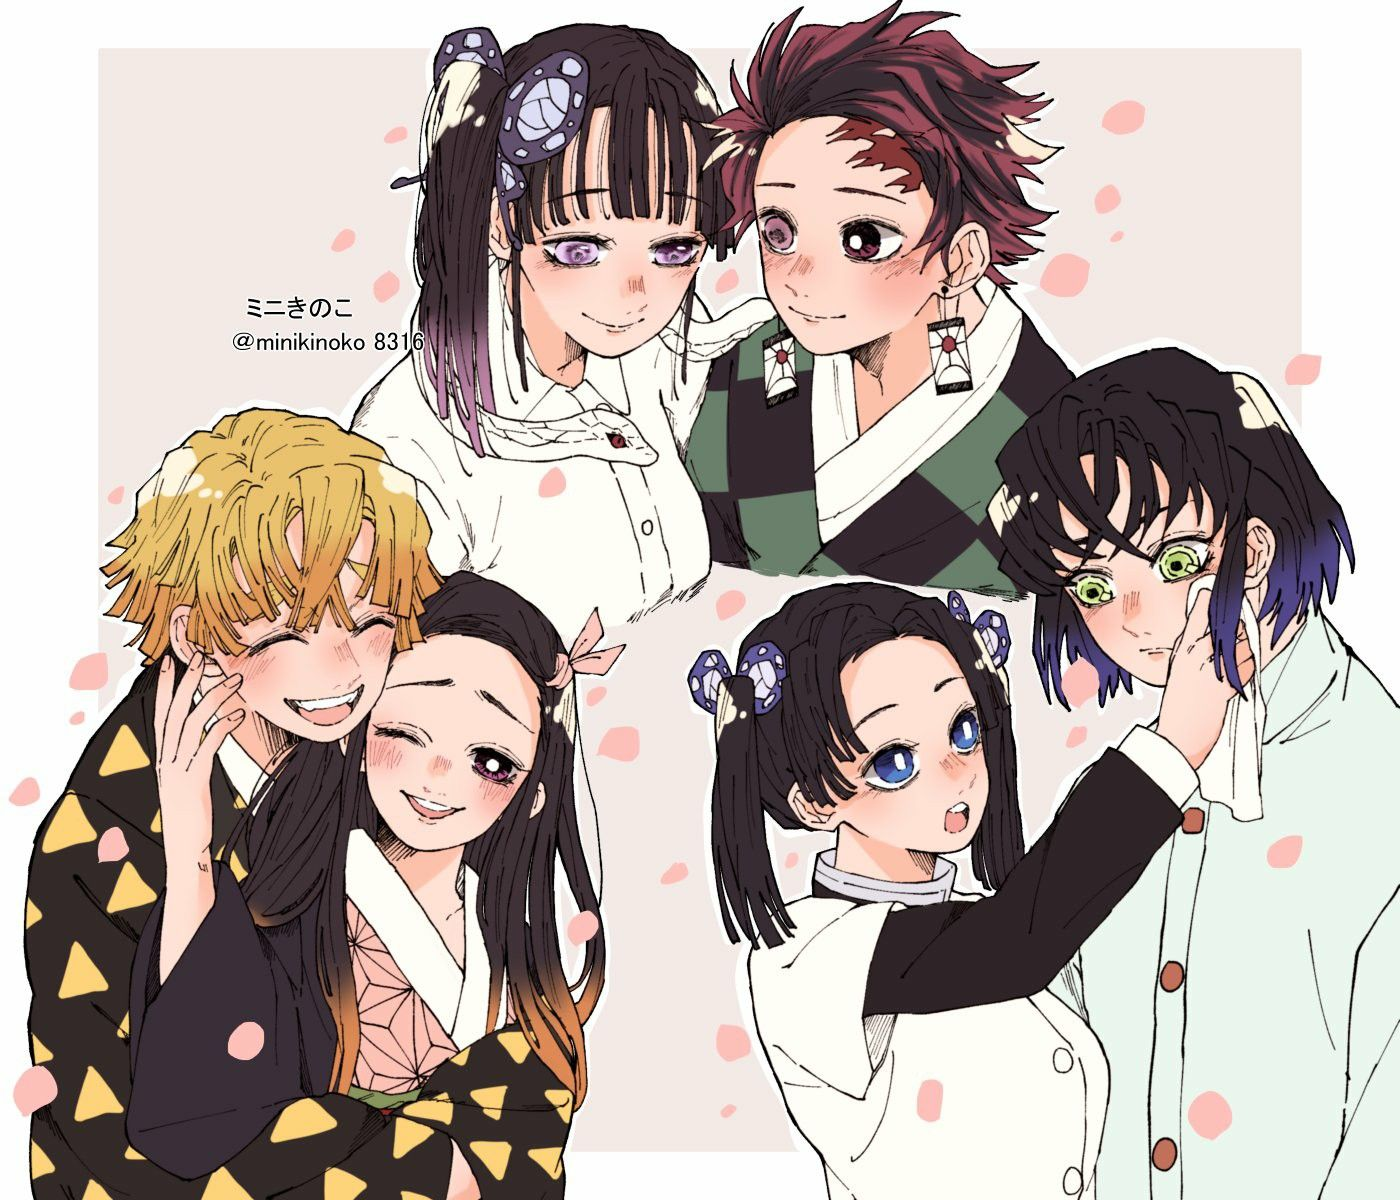 Pin by Anna yap on 鬼滅之刃 in 2020 Anime demon, Anime hug